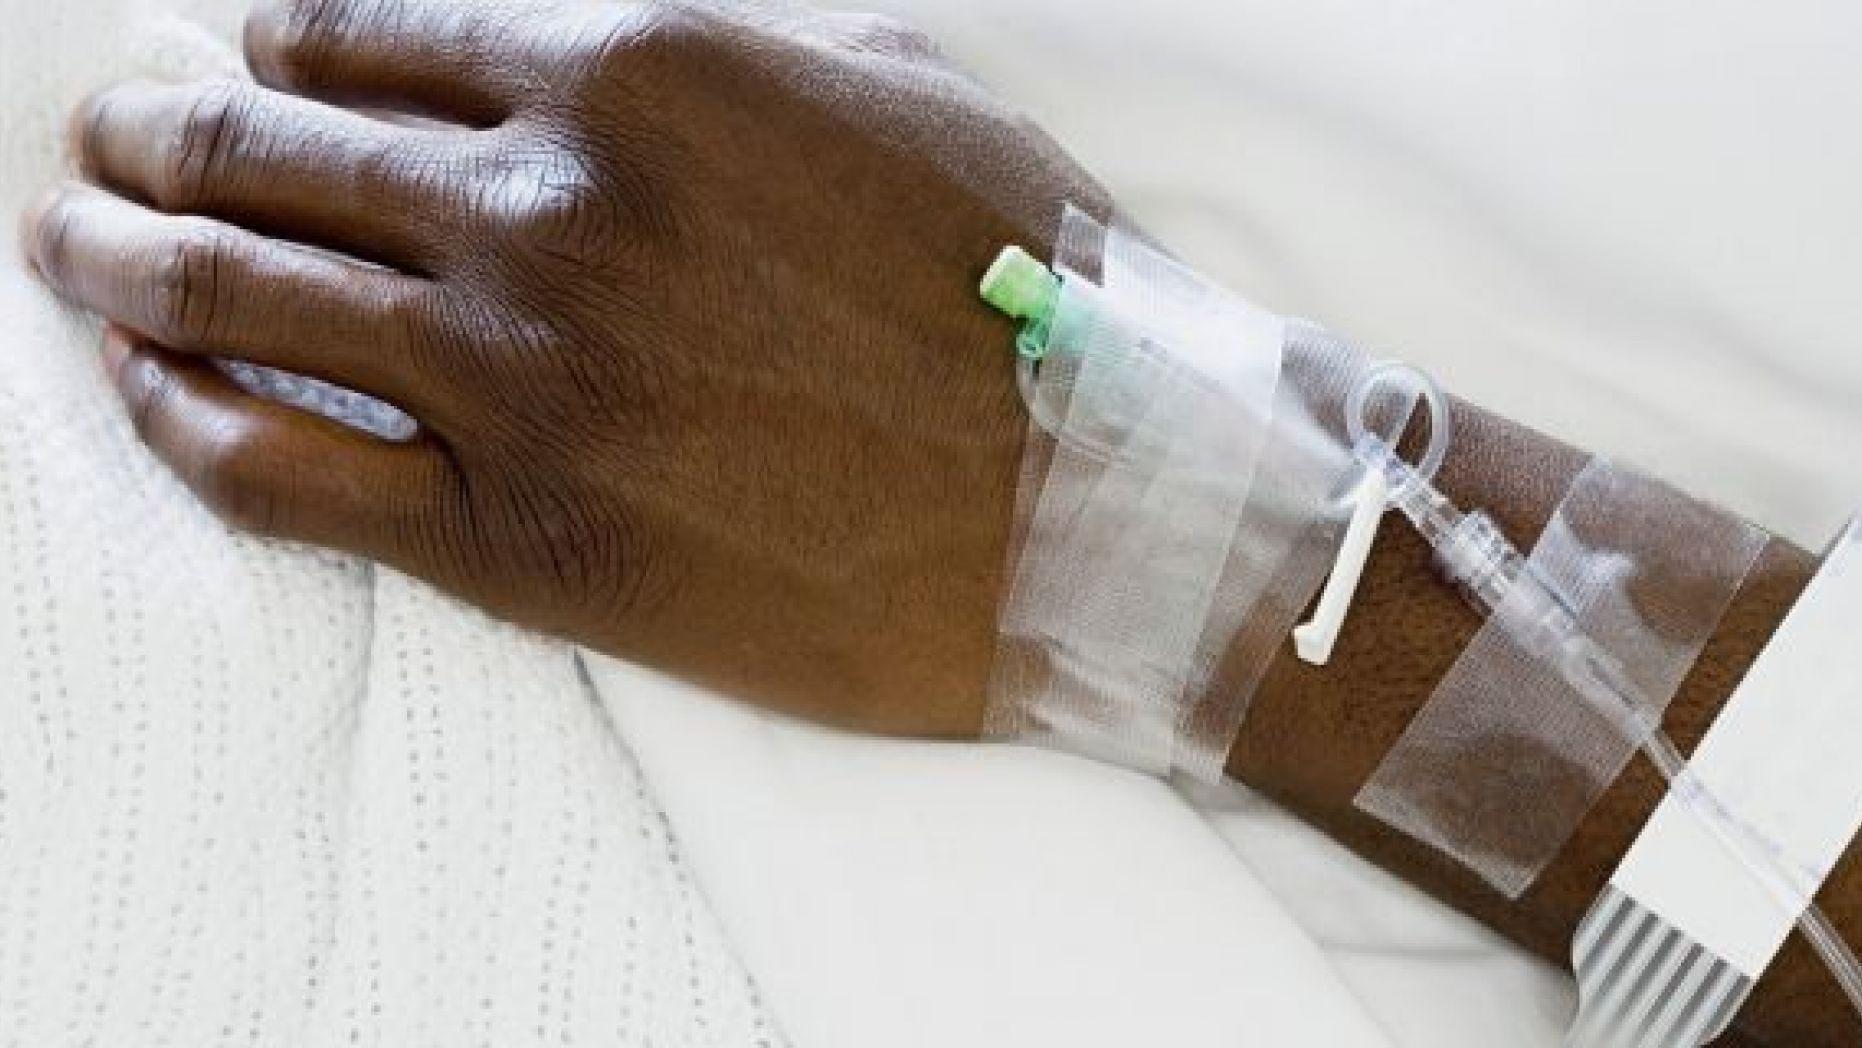 Drip infusion